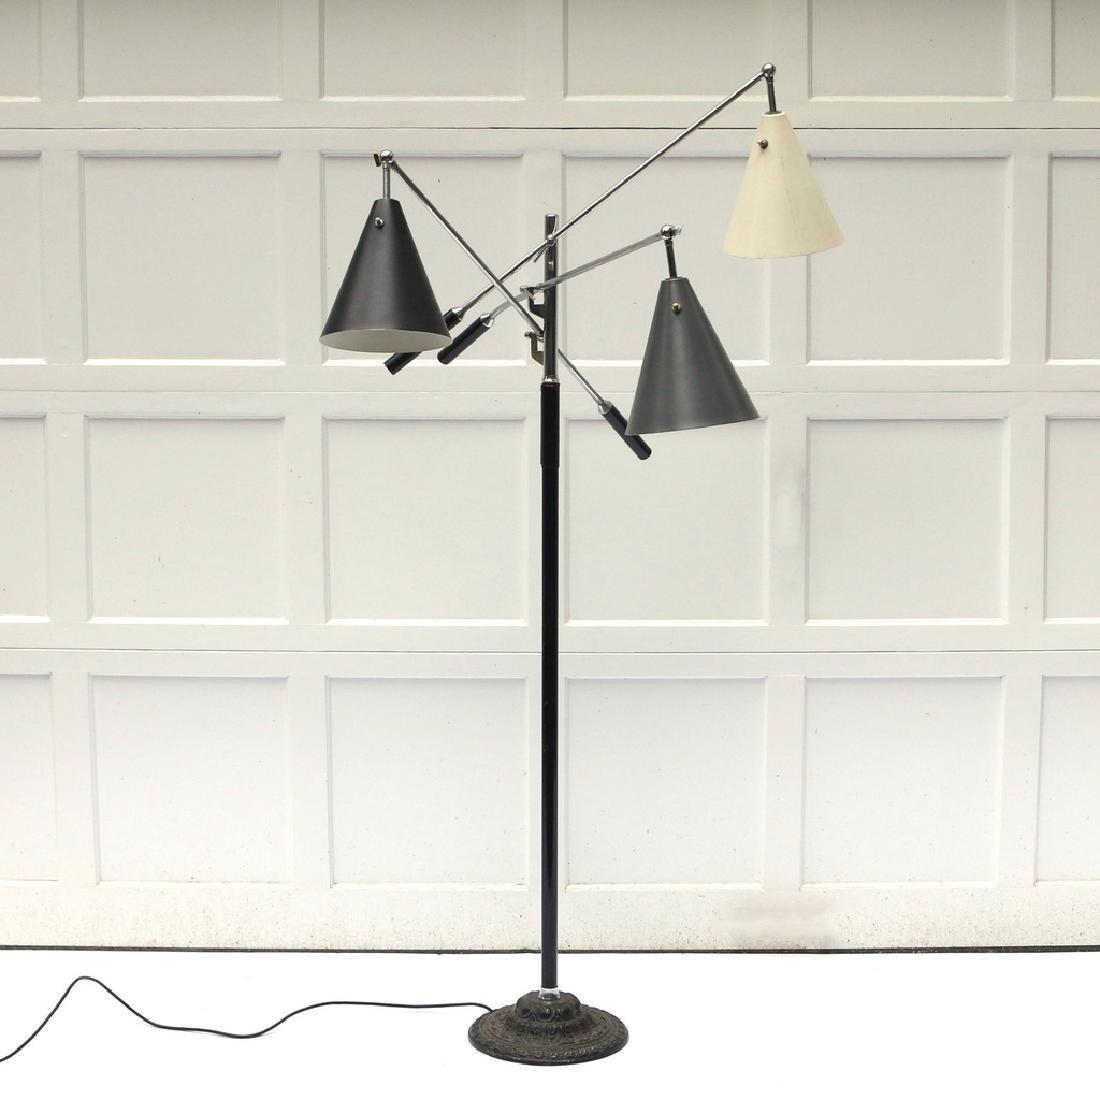 GINO SARFATTI TRIENNALE FLOOR LAMP